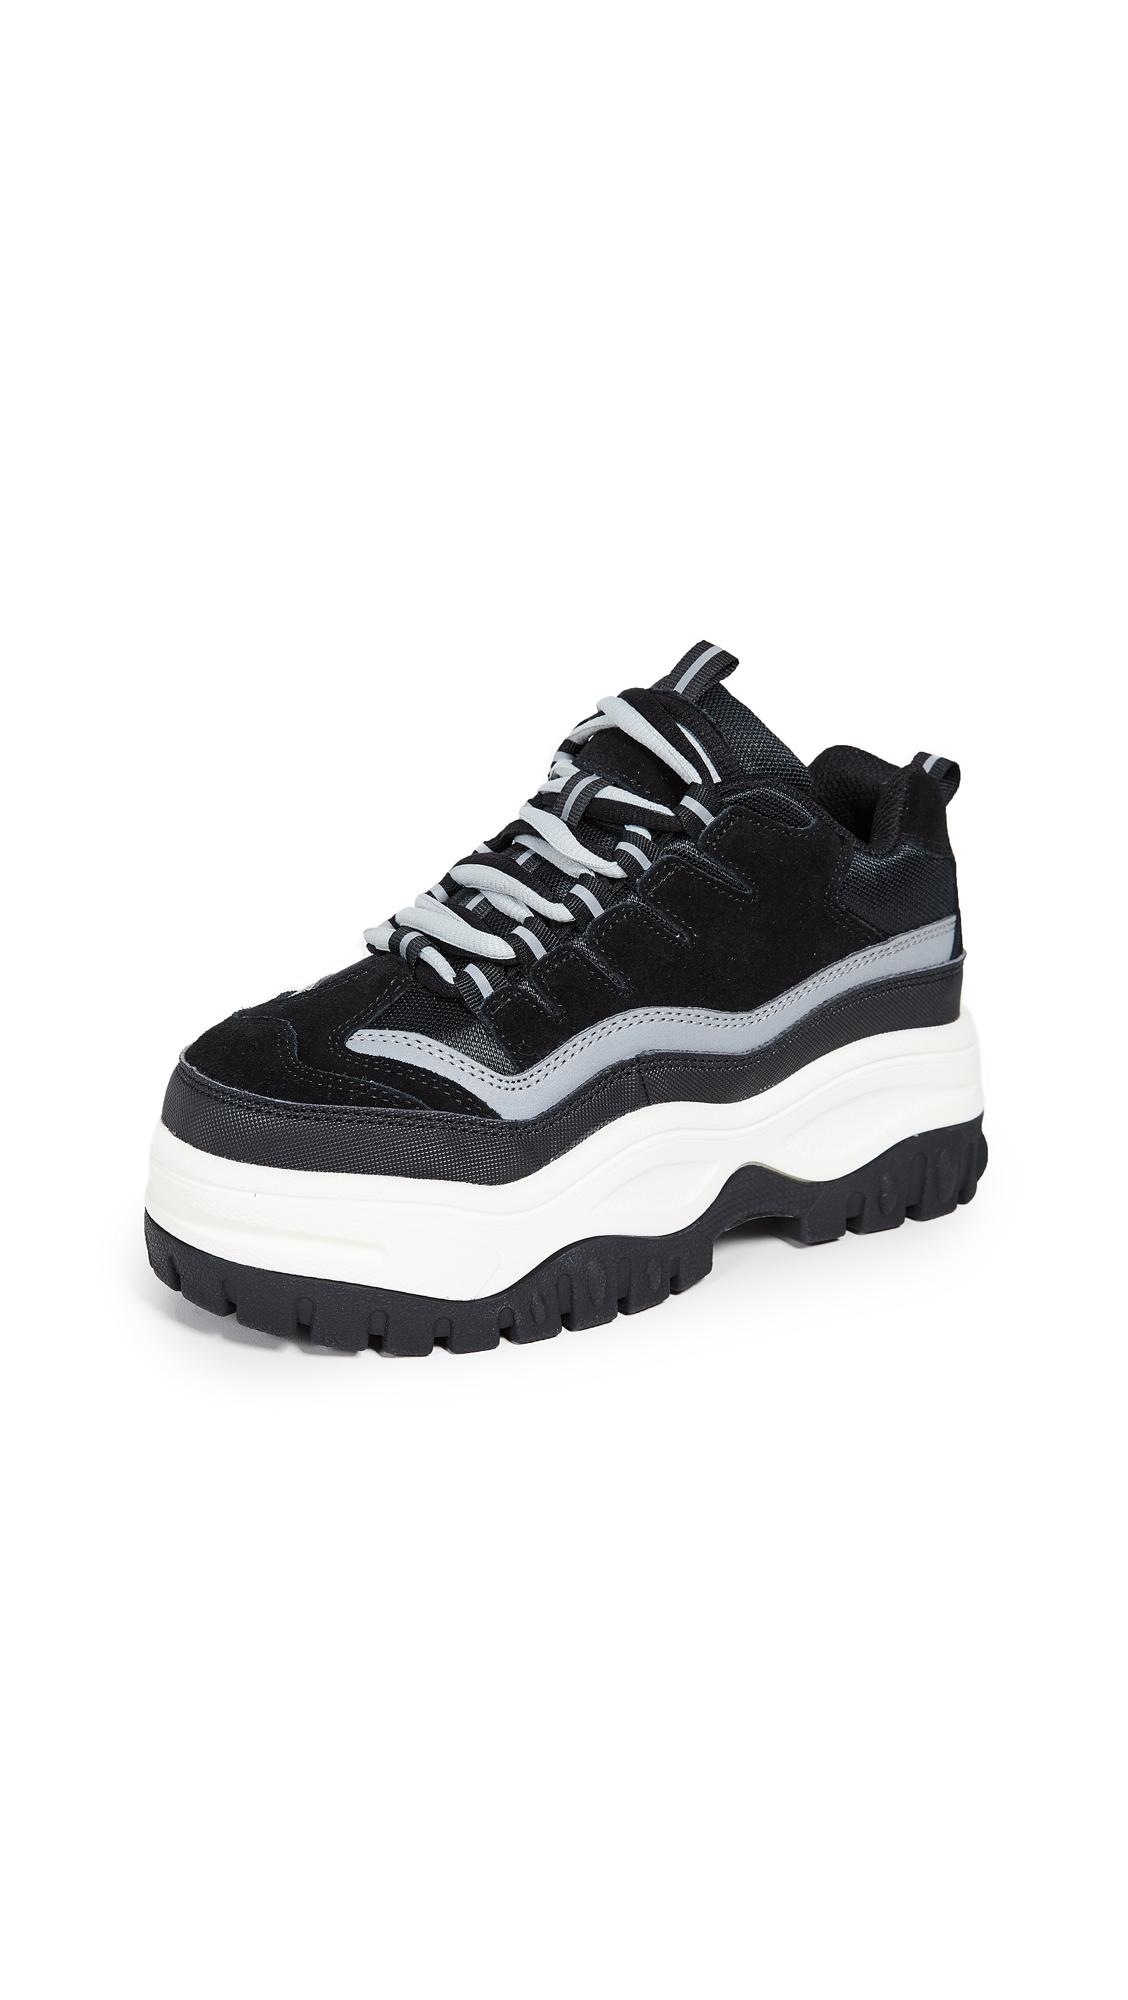 Jeffrey Campbell Pro Era Sneakers - Black